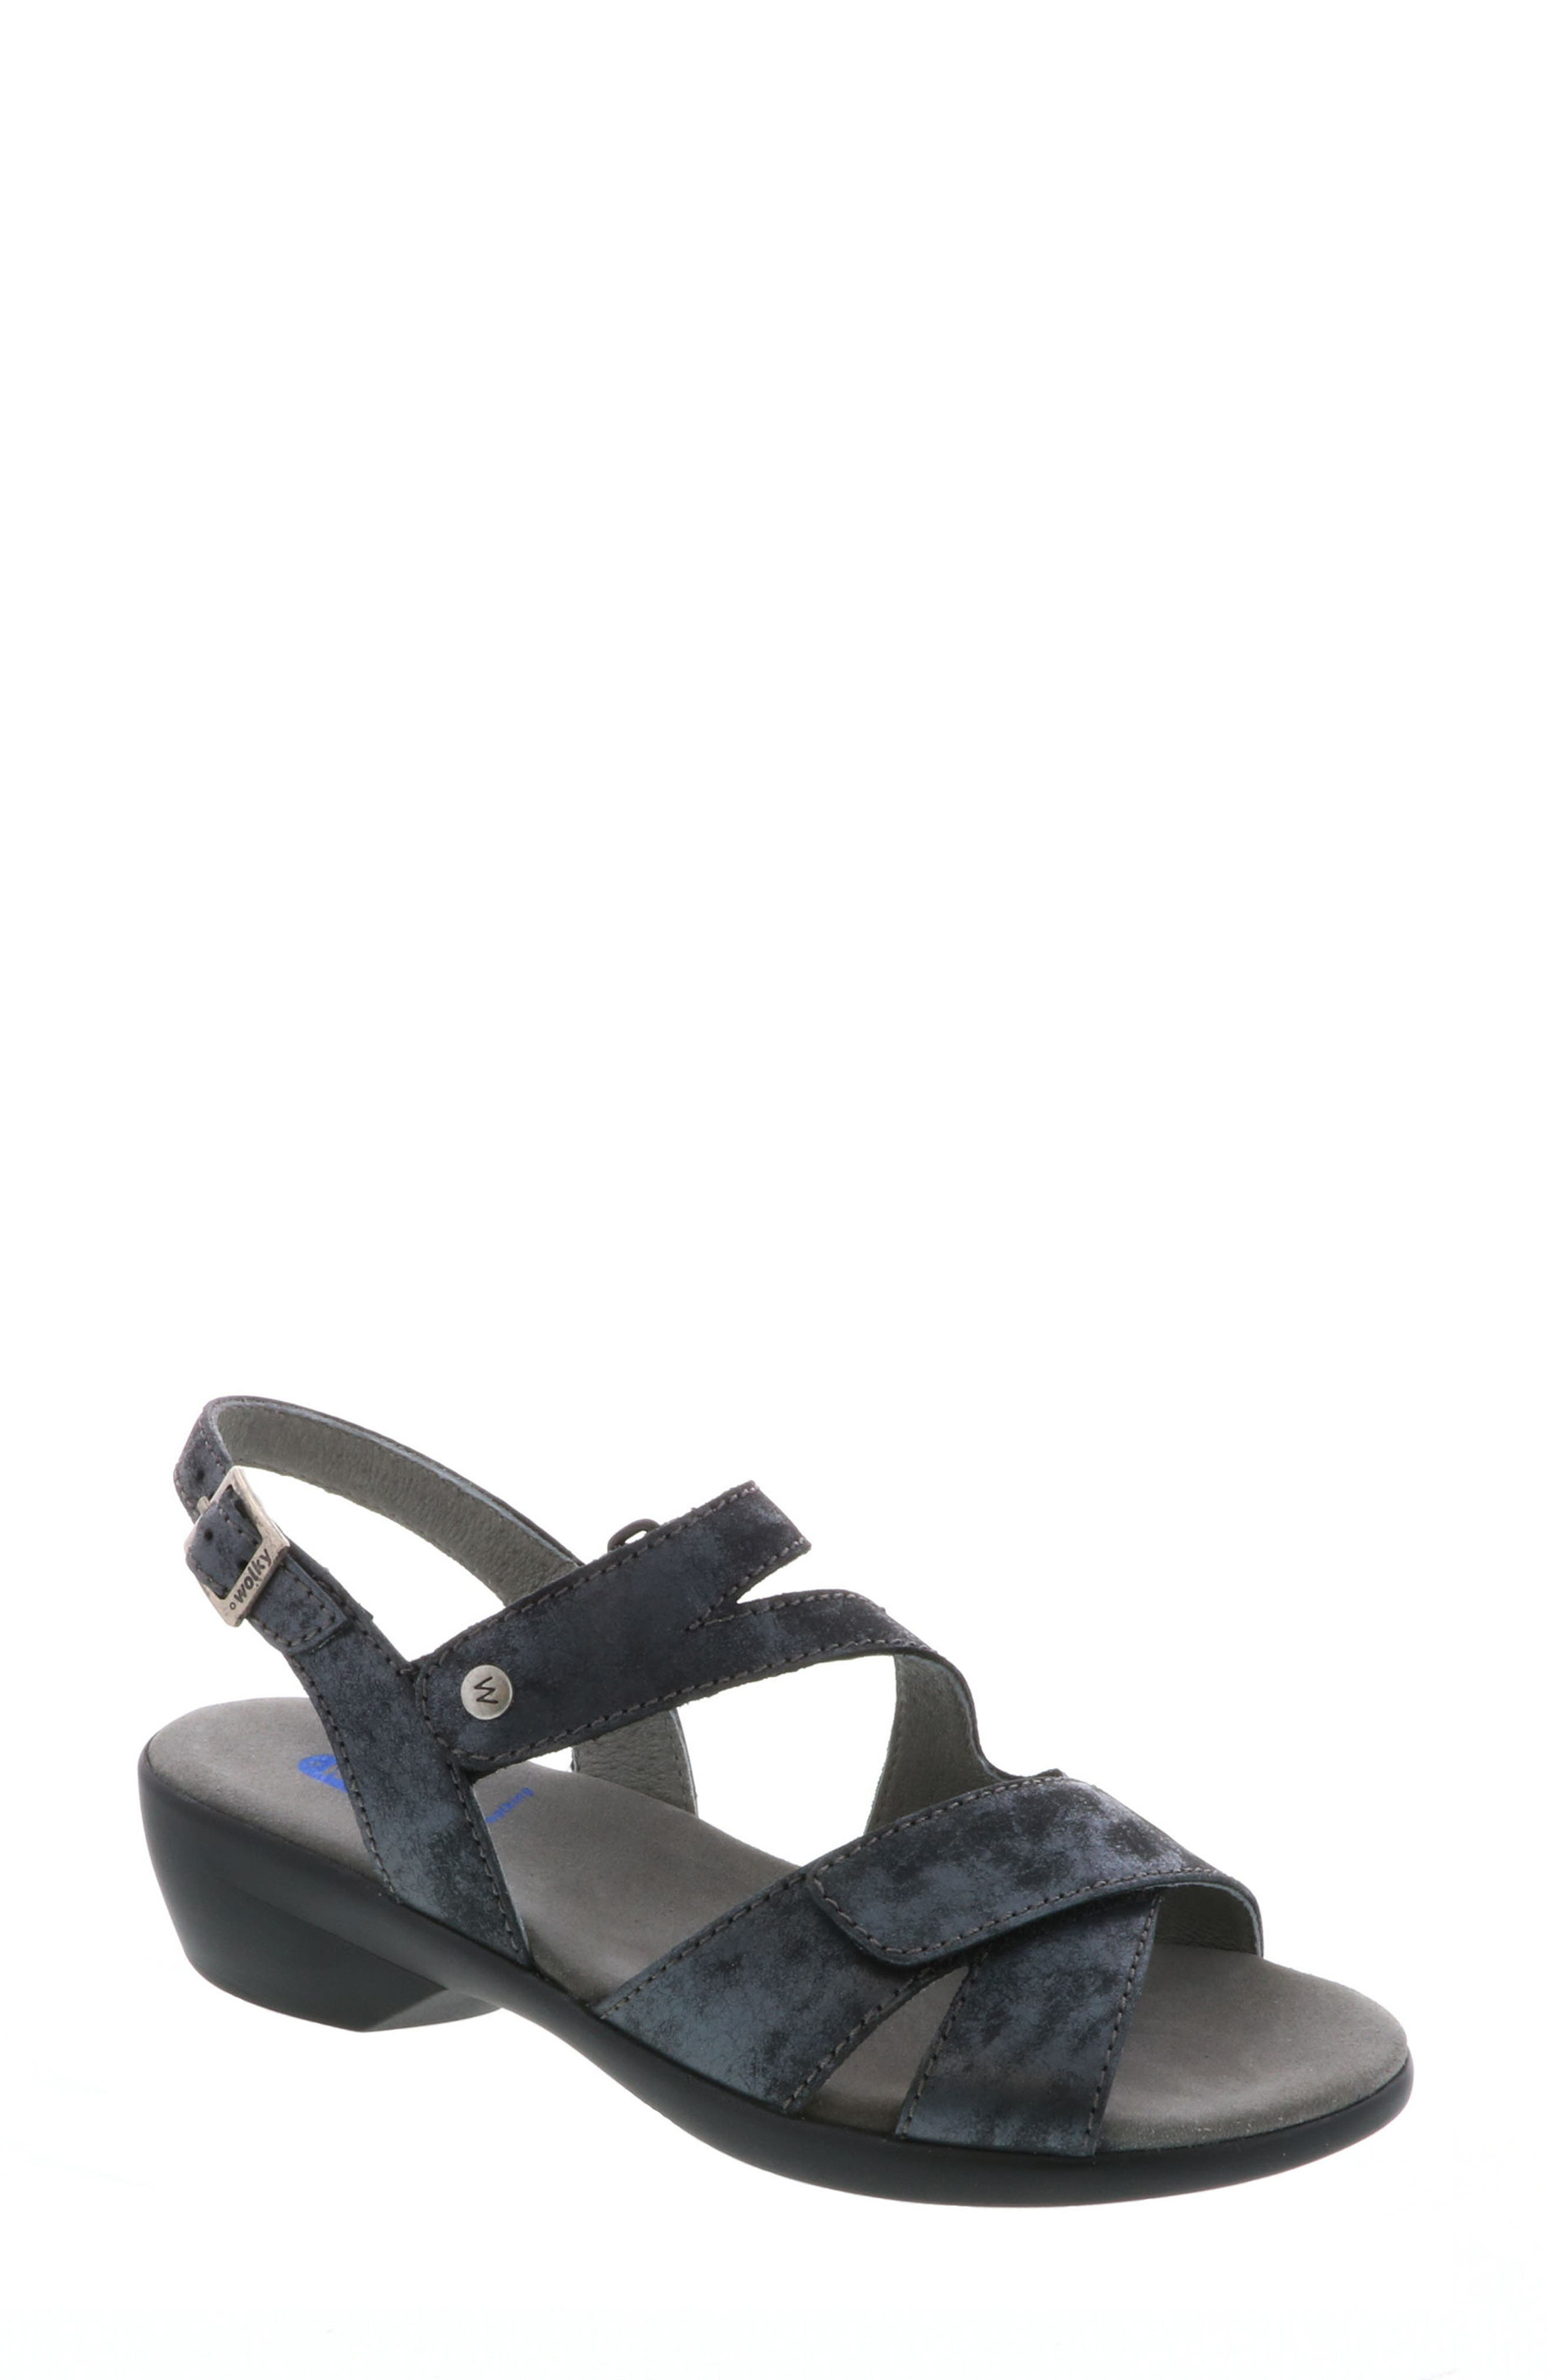 Fria Sandal,                         Main,                         color, Black Nubuck